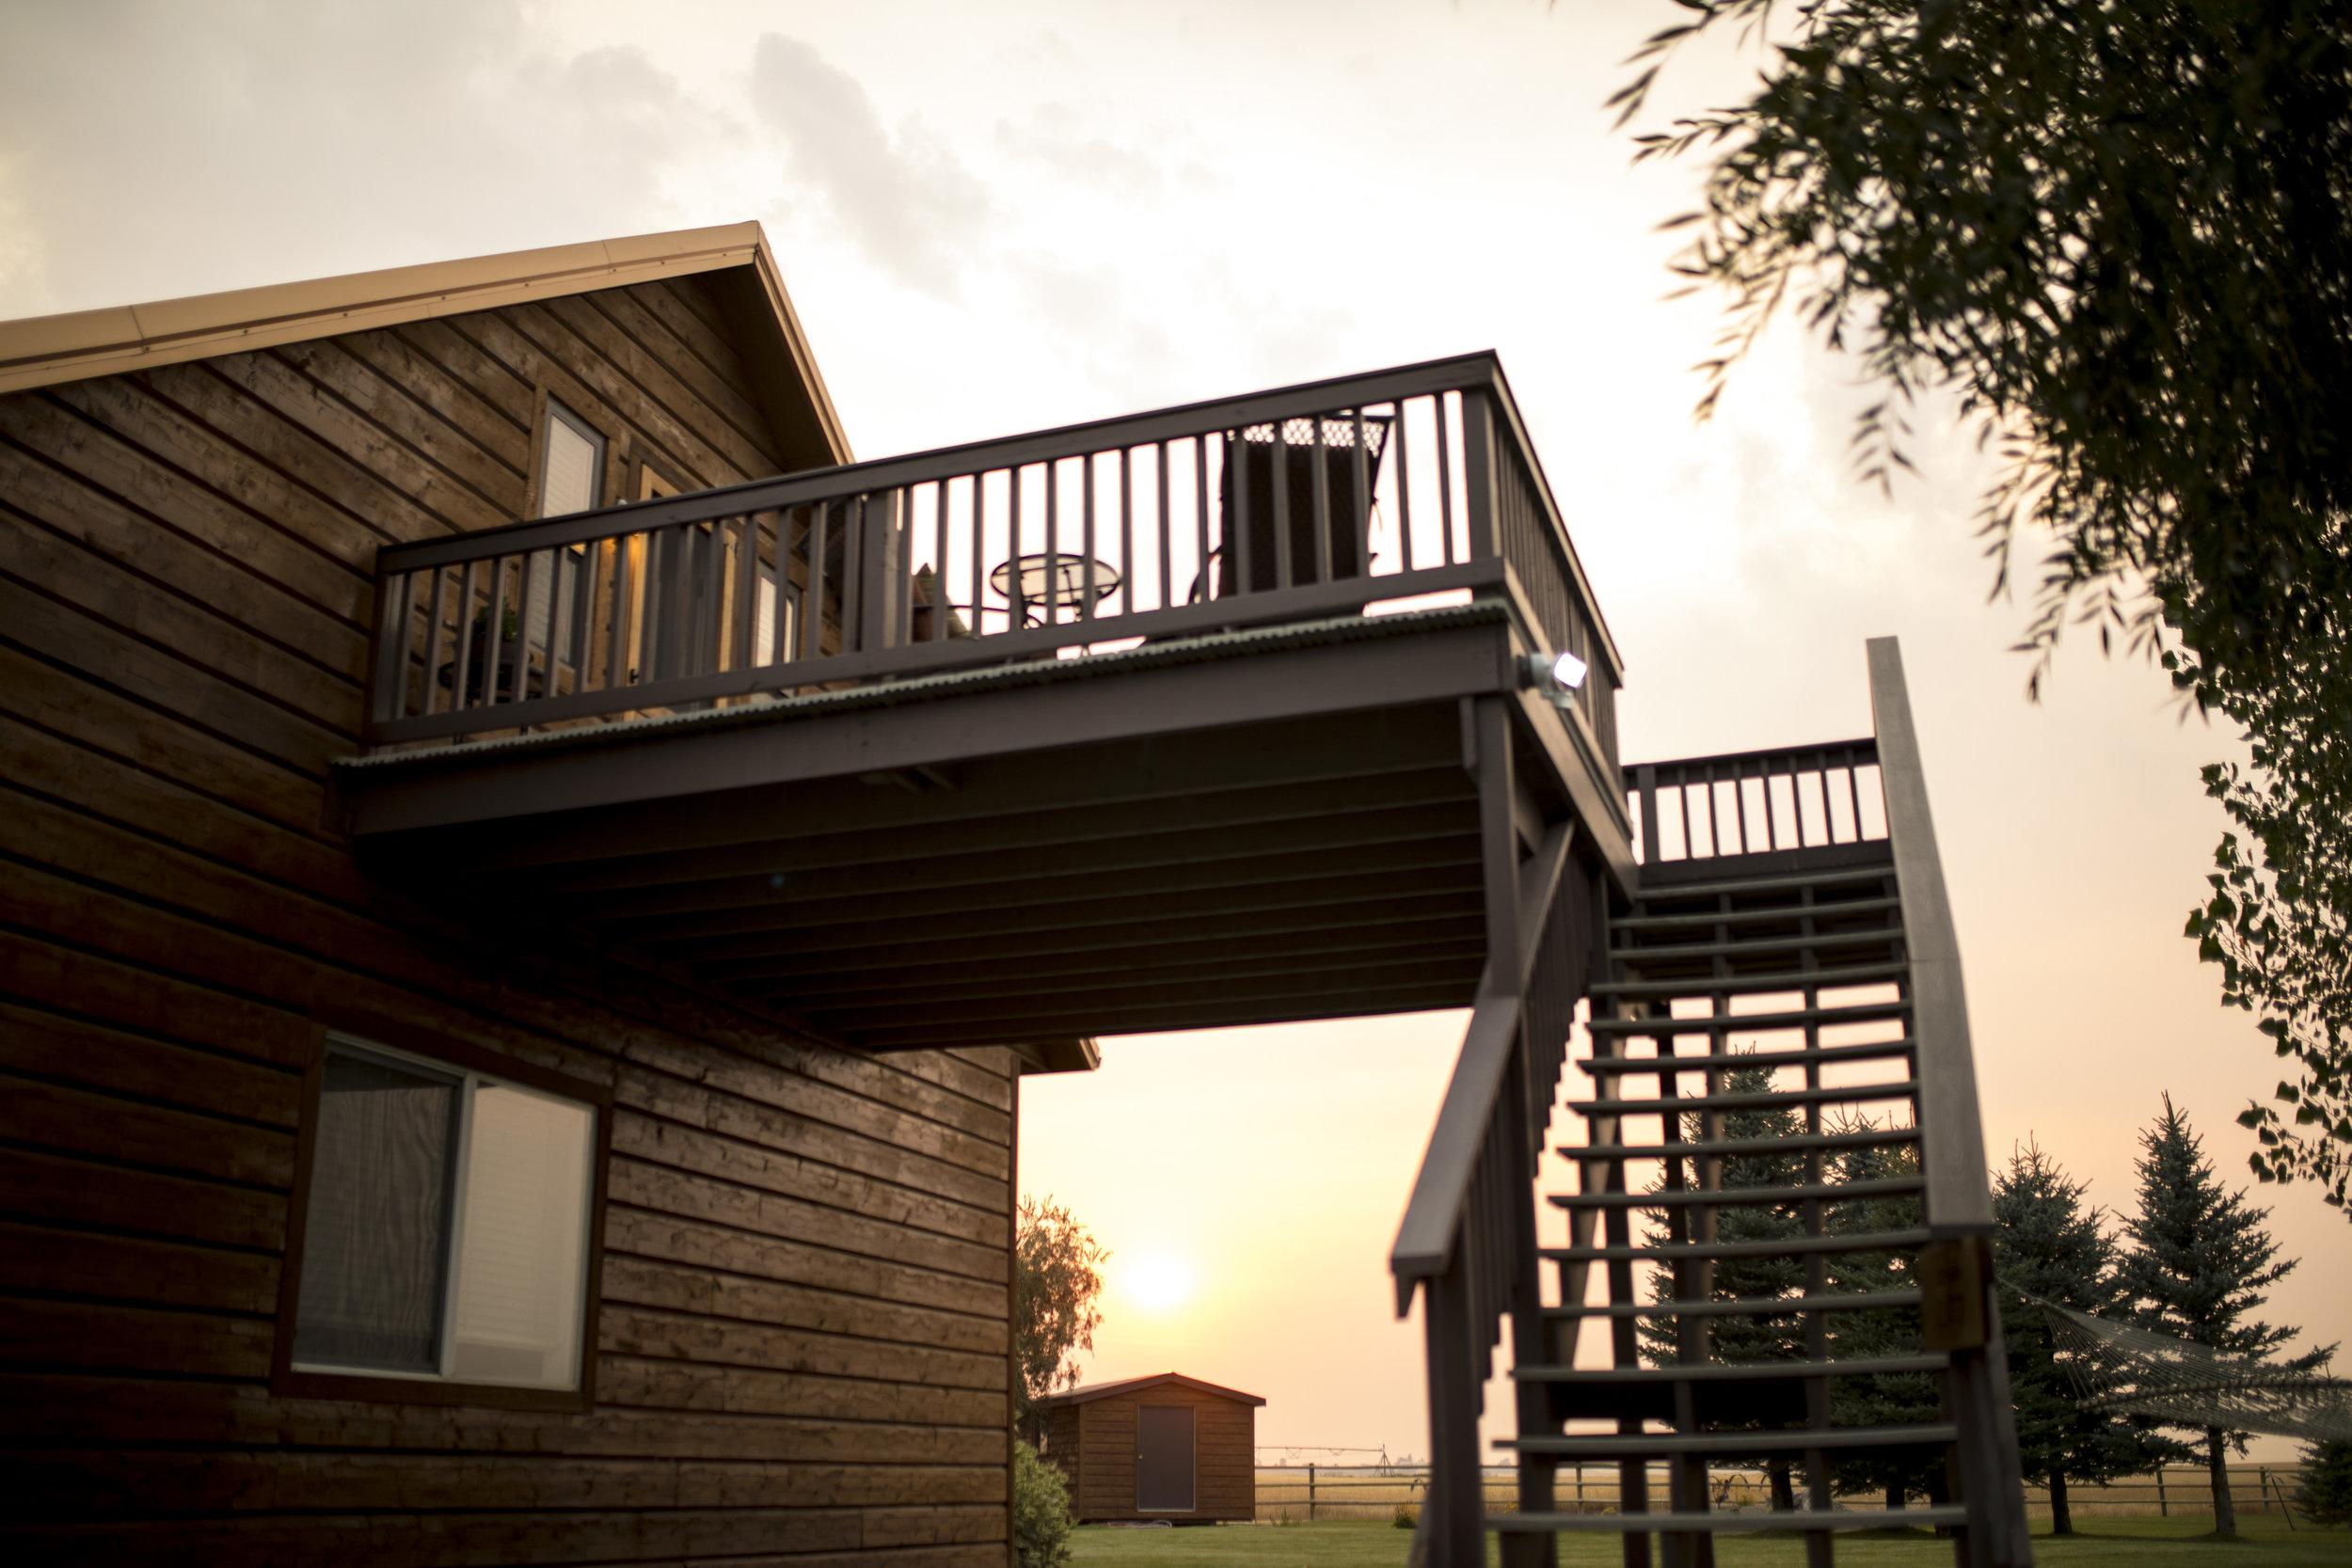 Bozeman, MT - Airbnb Loft Documentation Fall '17